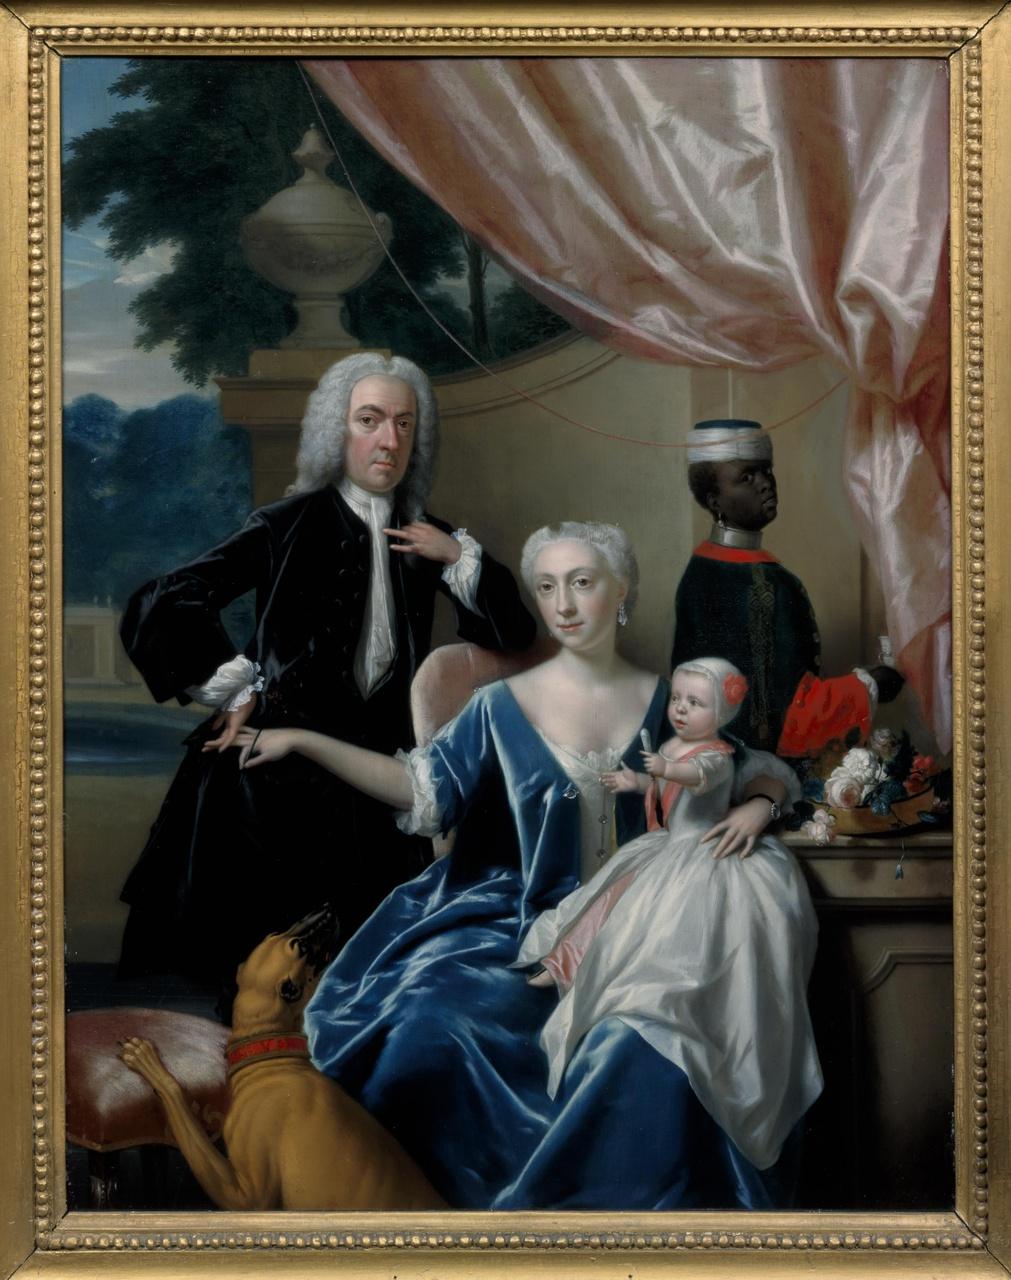 Portret van Johan Frederik van Friesheim (1685-1747), Marie Aimée van Friesheim-de Rapin de Thoyras (1716-1800) en hun zoon Johan Frederik (Godfried) van Friesheim (1738-1776) met een page